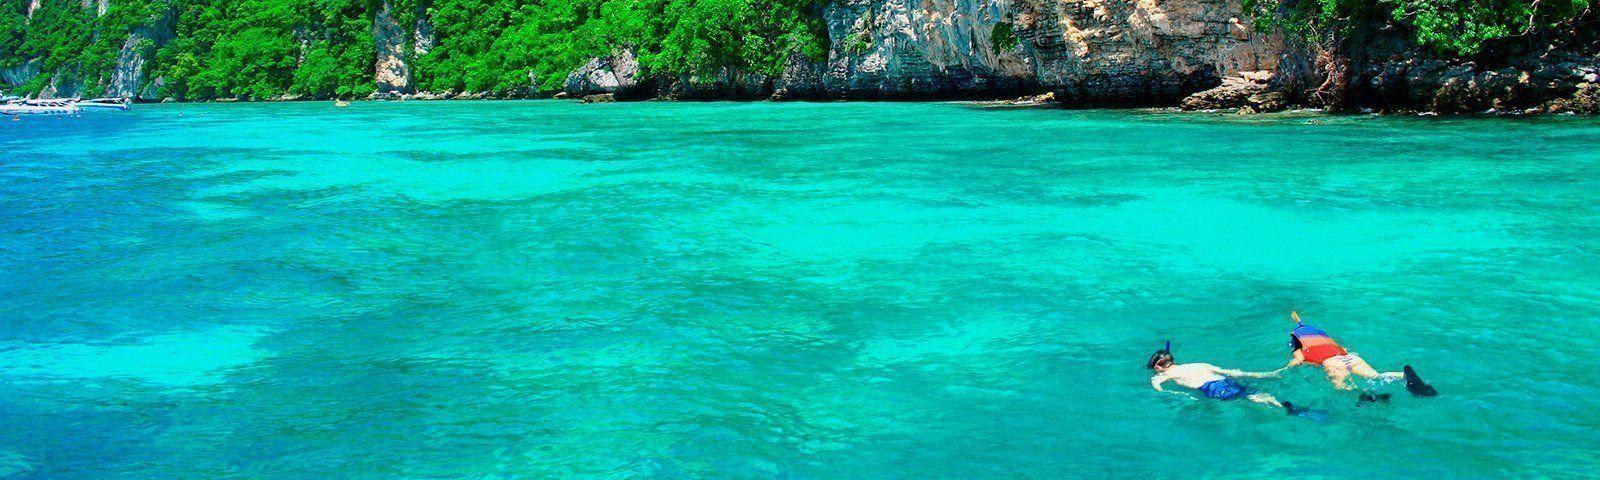 travesia-tailandia-barco-catamaran (5)